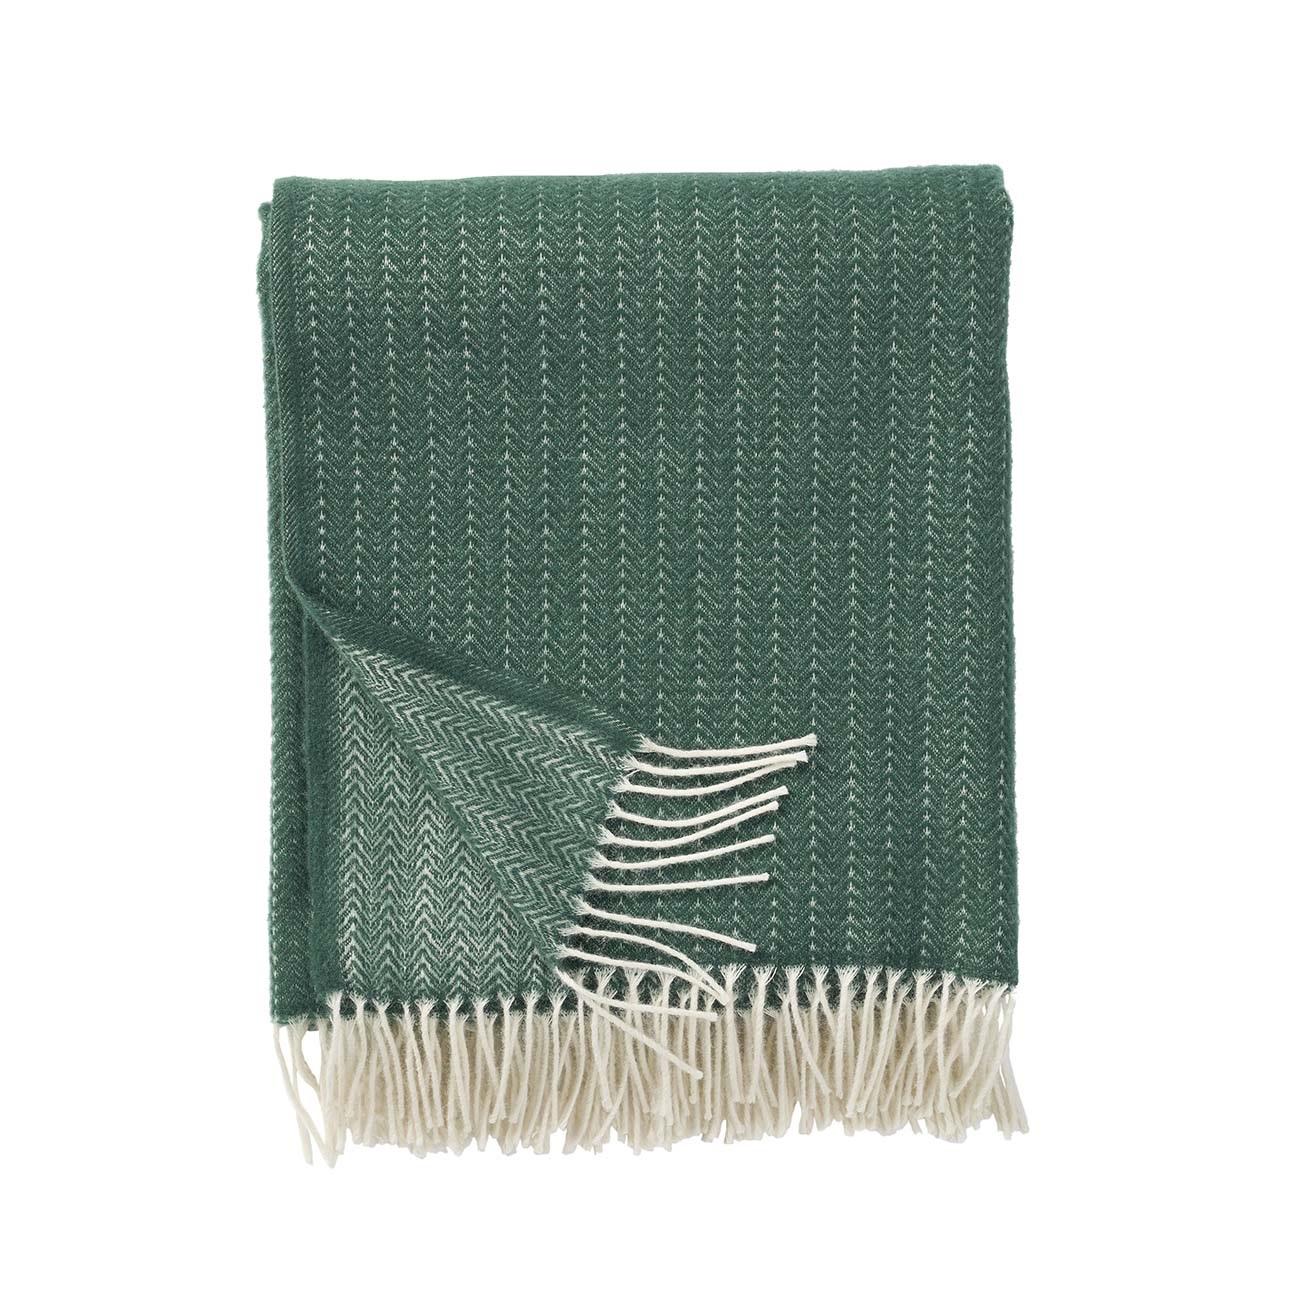 PIN STRIPE premium kashmir mörkgrön, Klippan Yllefabrik